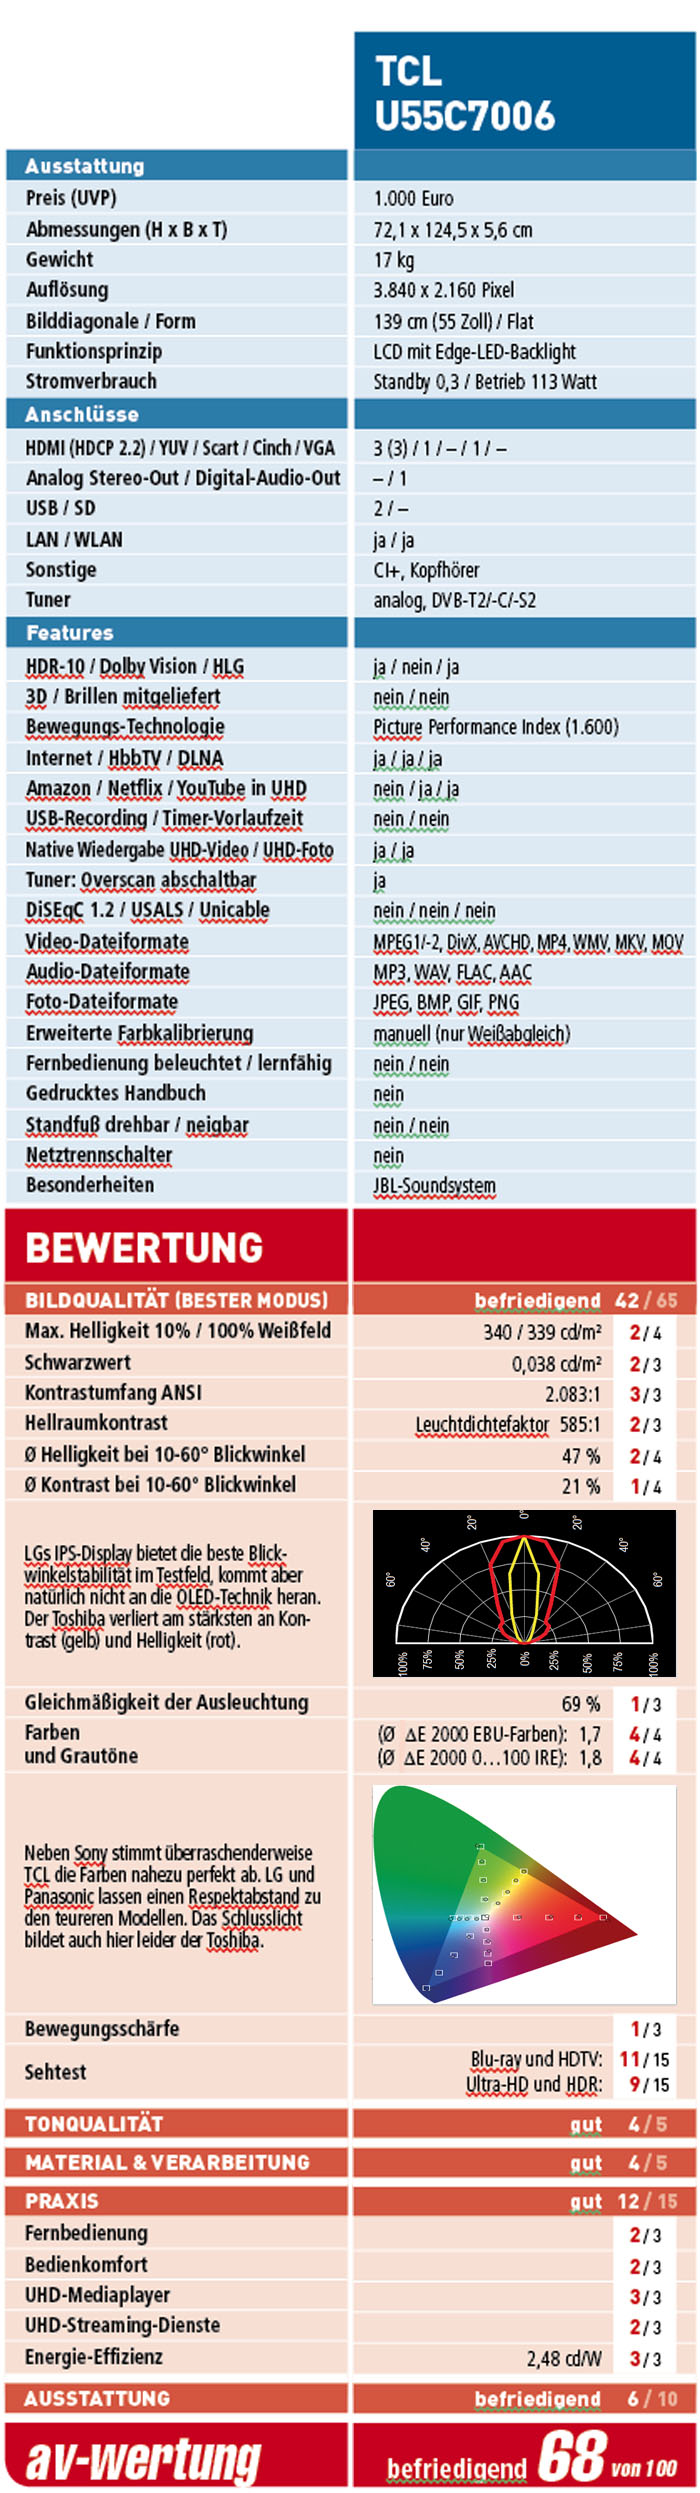 Schön Auto Stereo Verkabelung Farben Fotos - Schaltplan Serie ...